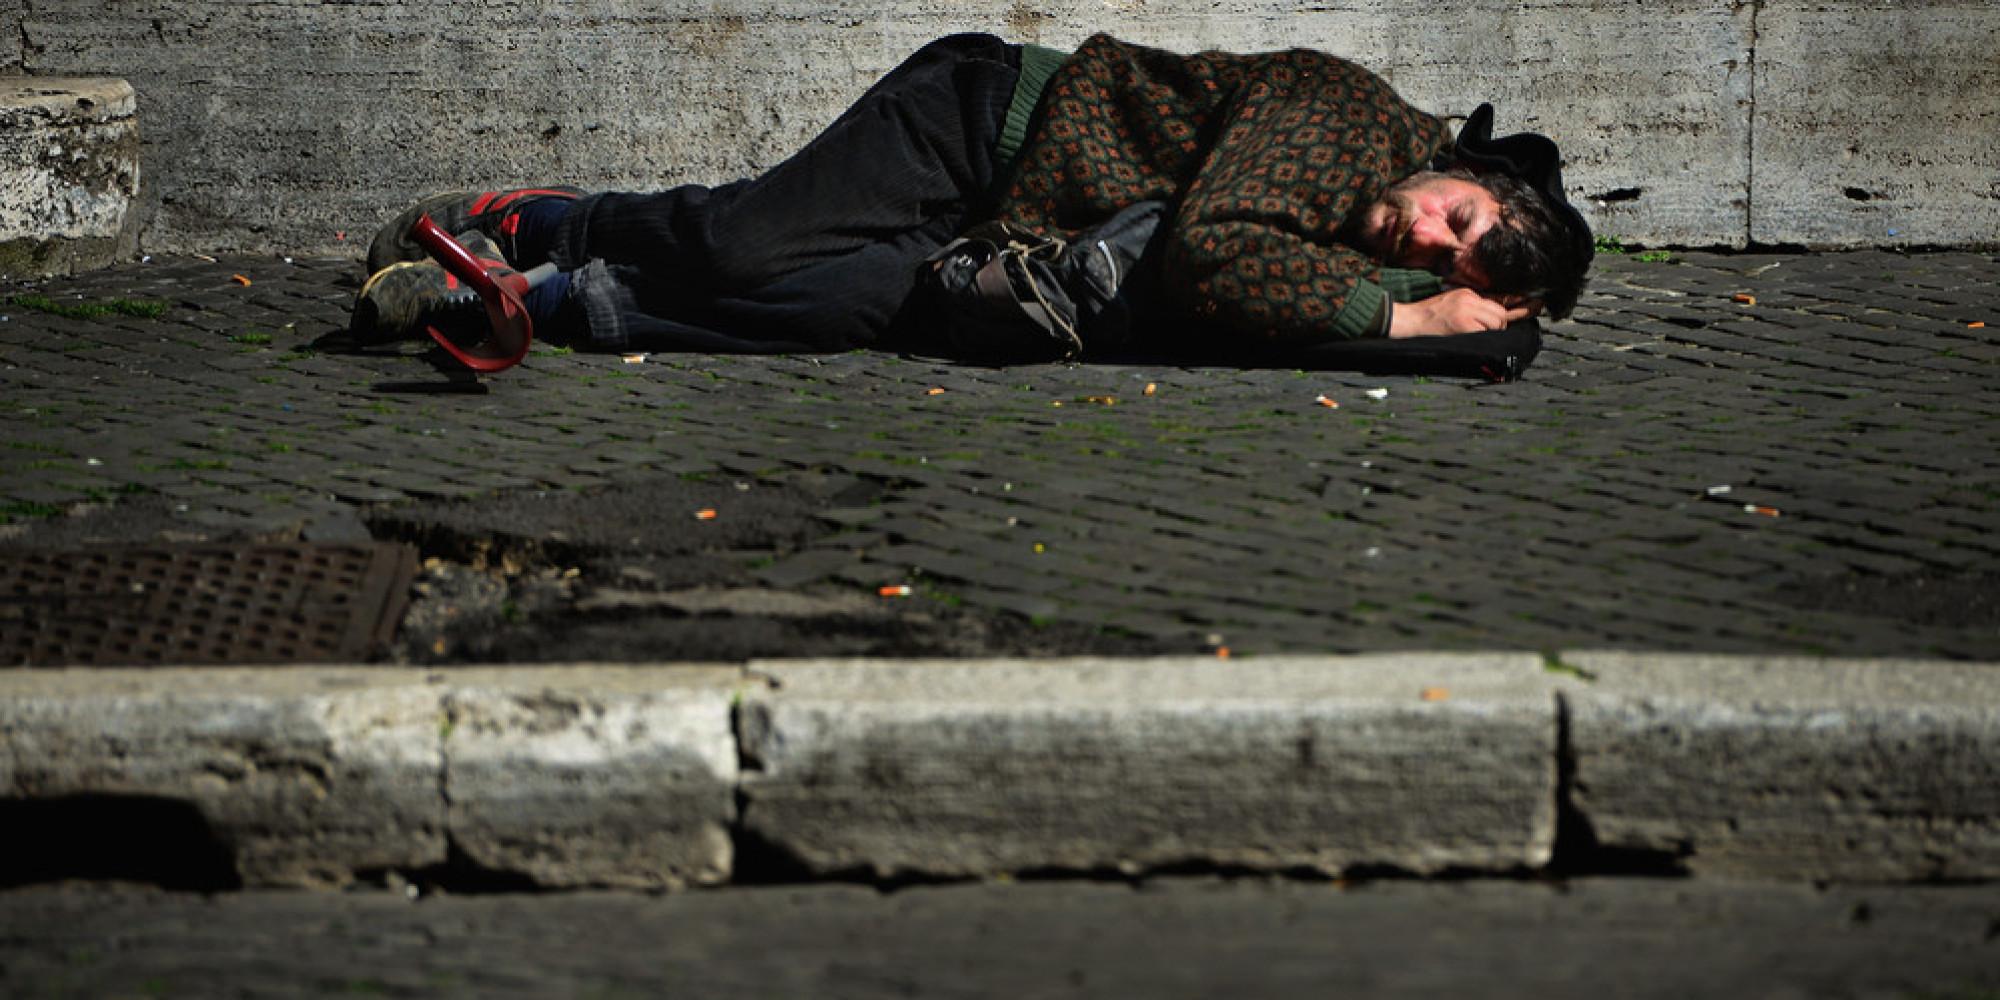 o-HOMELESSMAN-SLEEPING-ON-STREET-facebook.jpg